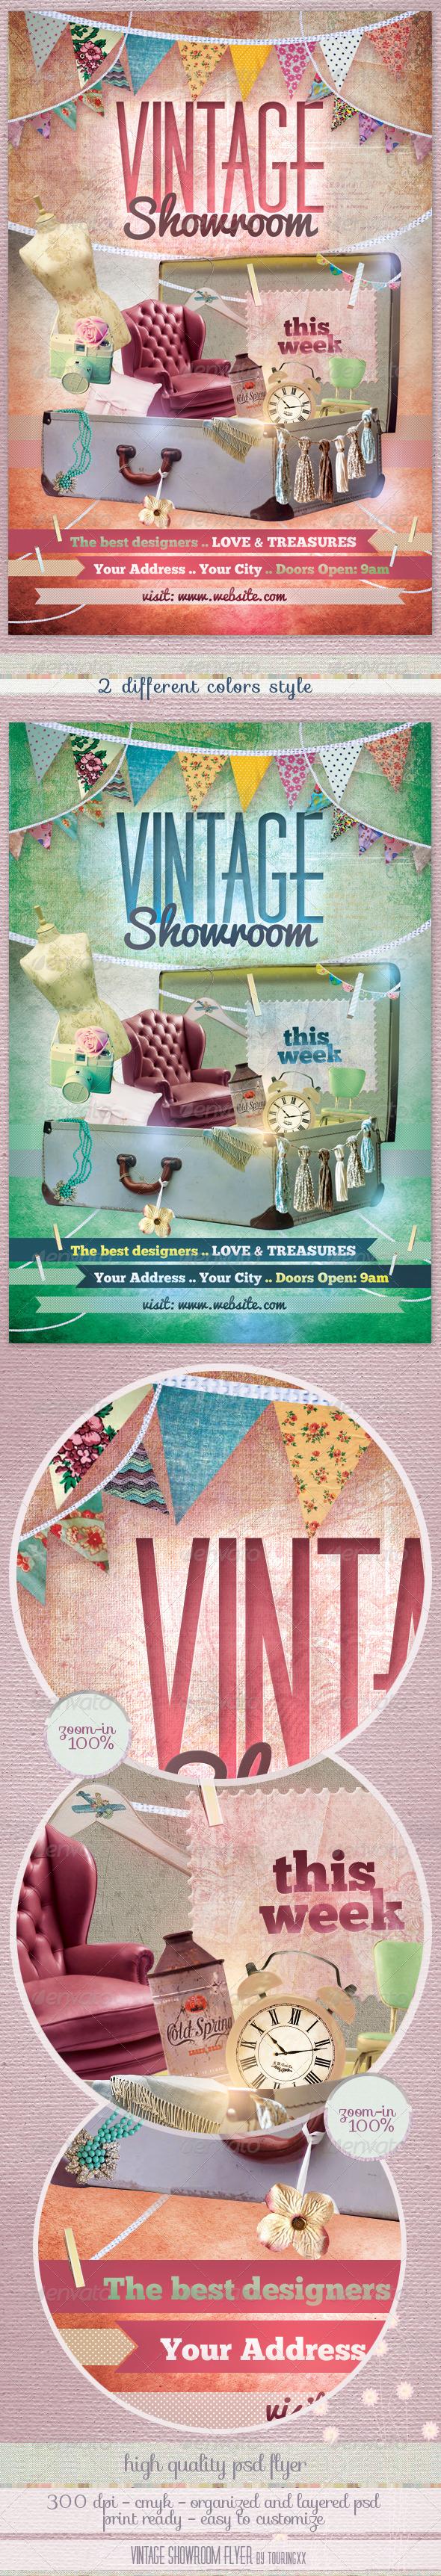 GraphicRiver Vintage Showroom Flyer Template 3031551